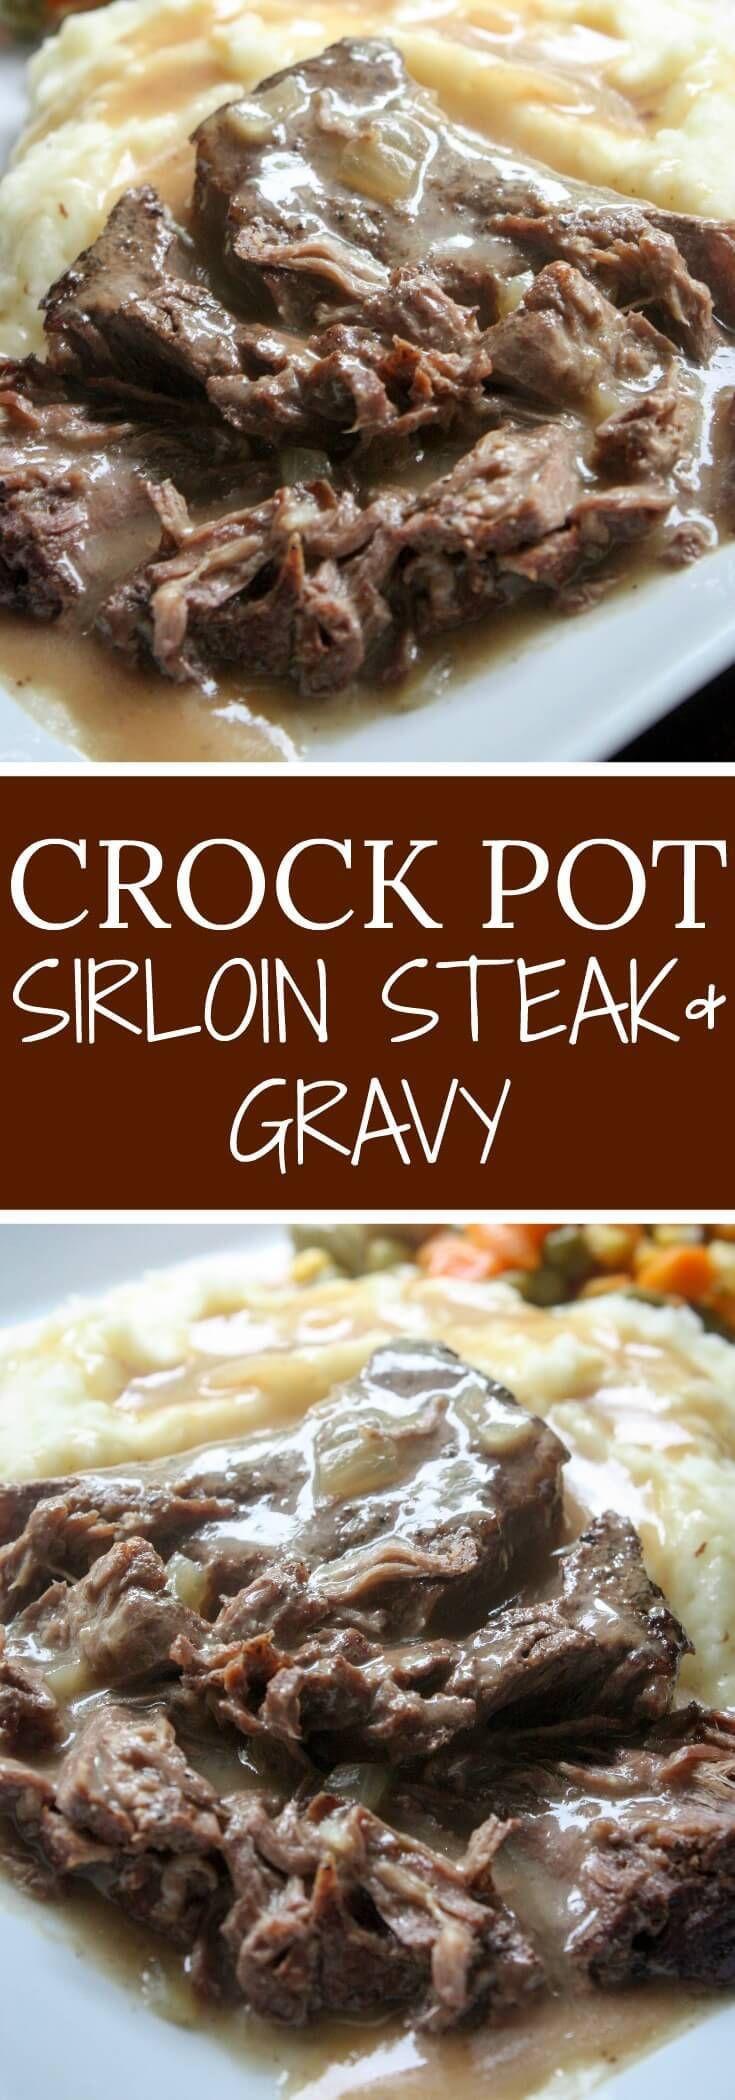 Healthy Cube Steak Slow Cooker Recipes  Slow Cooker Sirloin Steak and Gravy Recipe